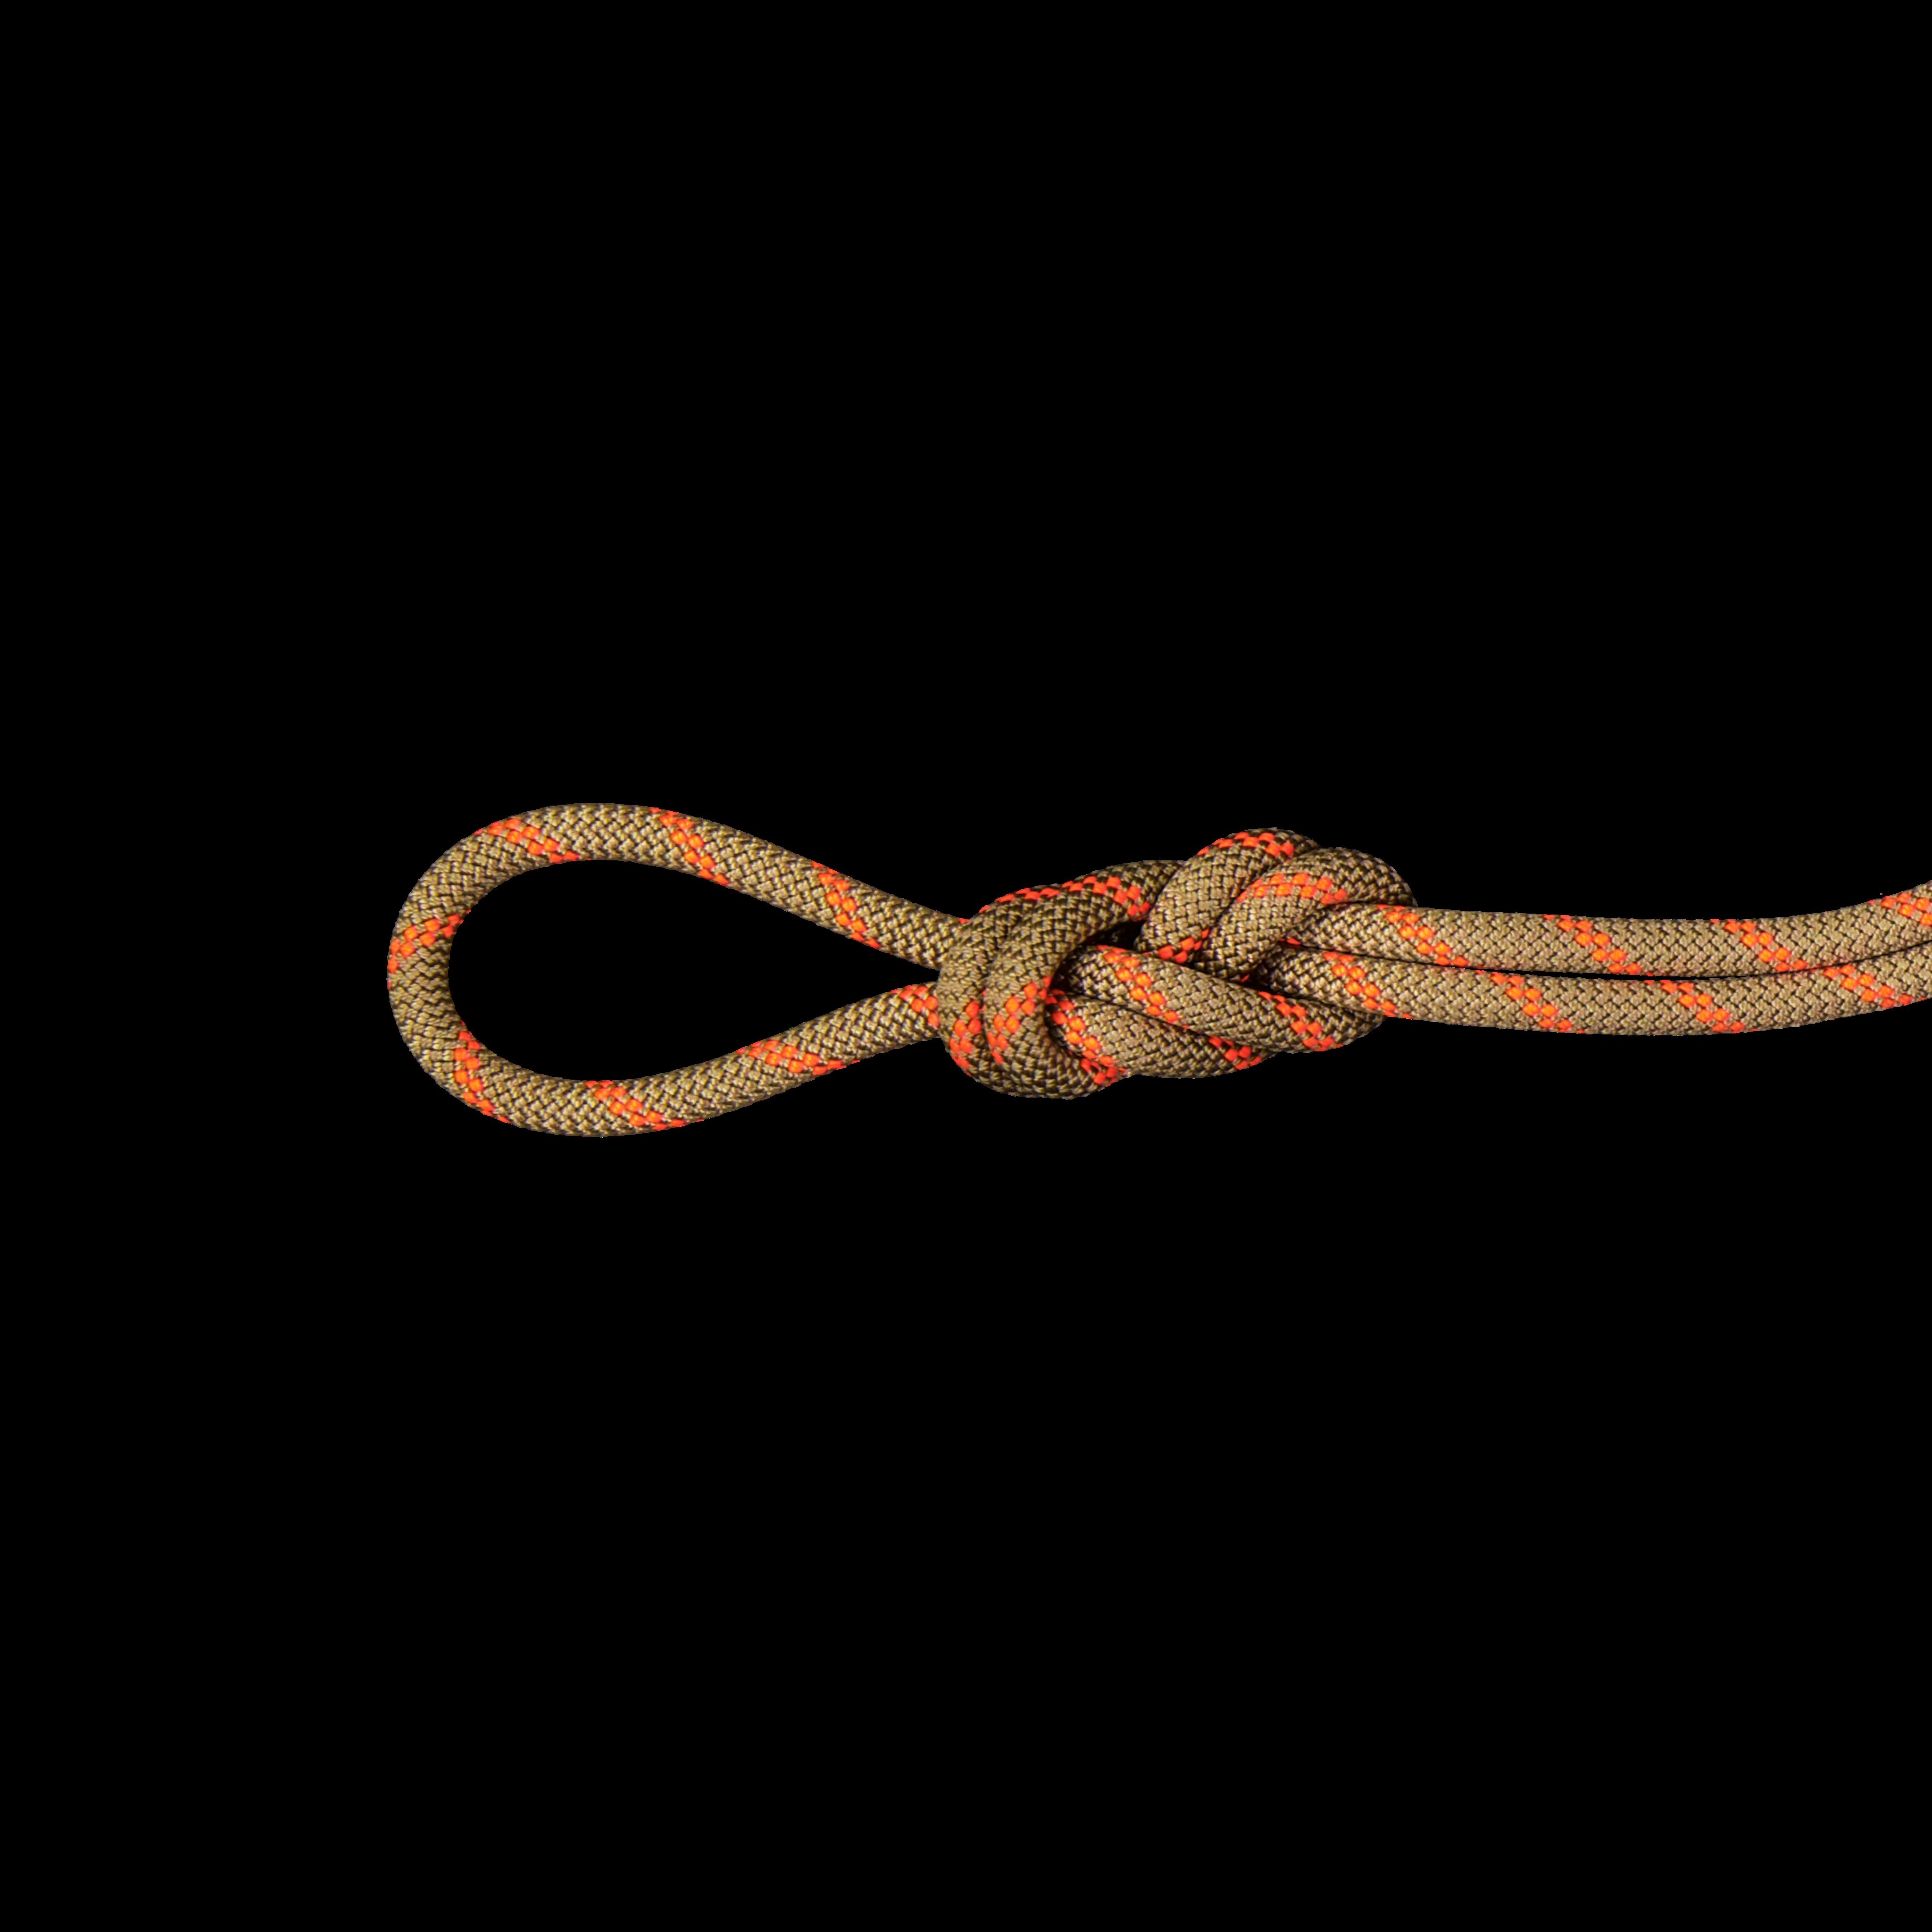 8.0 Alpine Dry Rope - 30 m, Dry Standard, boa-safety orange thumbnail